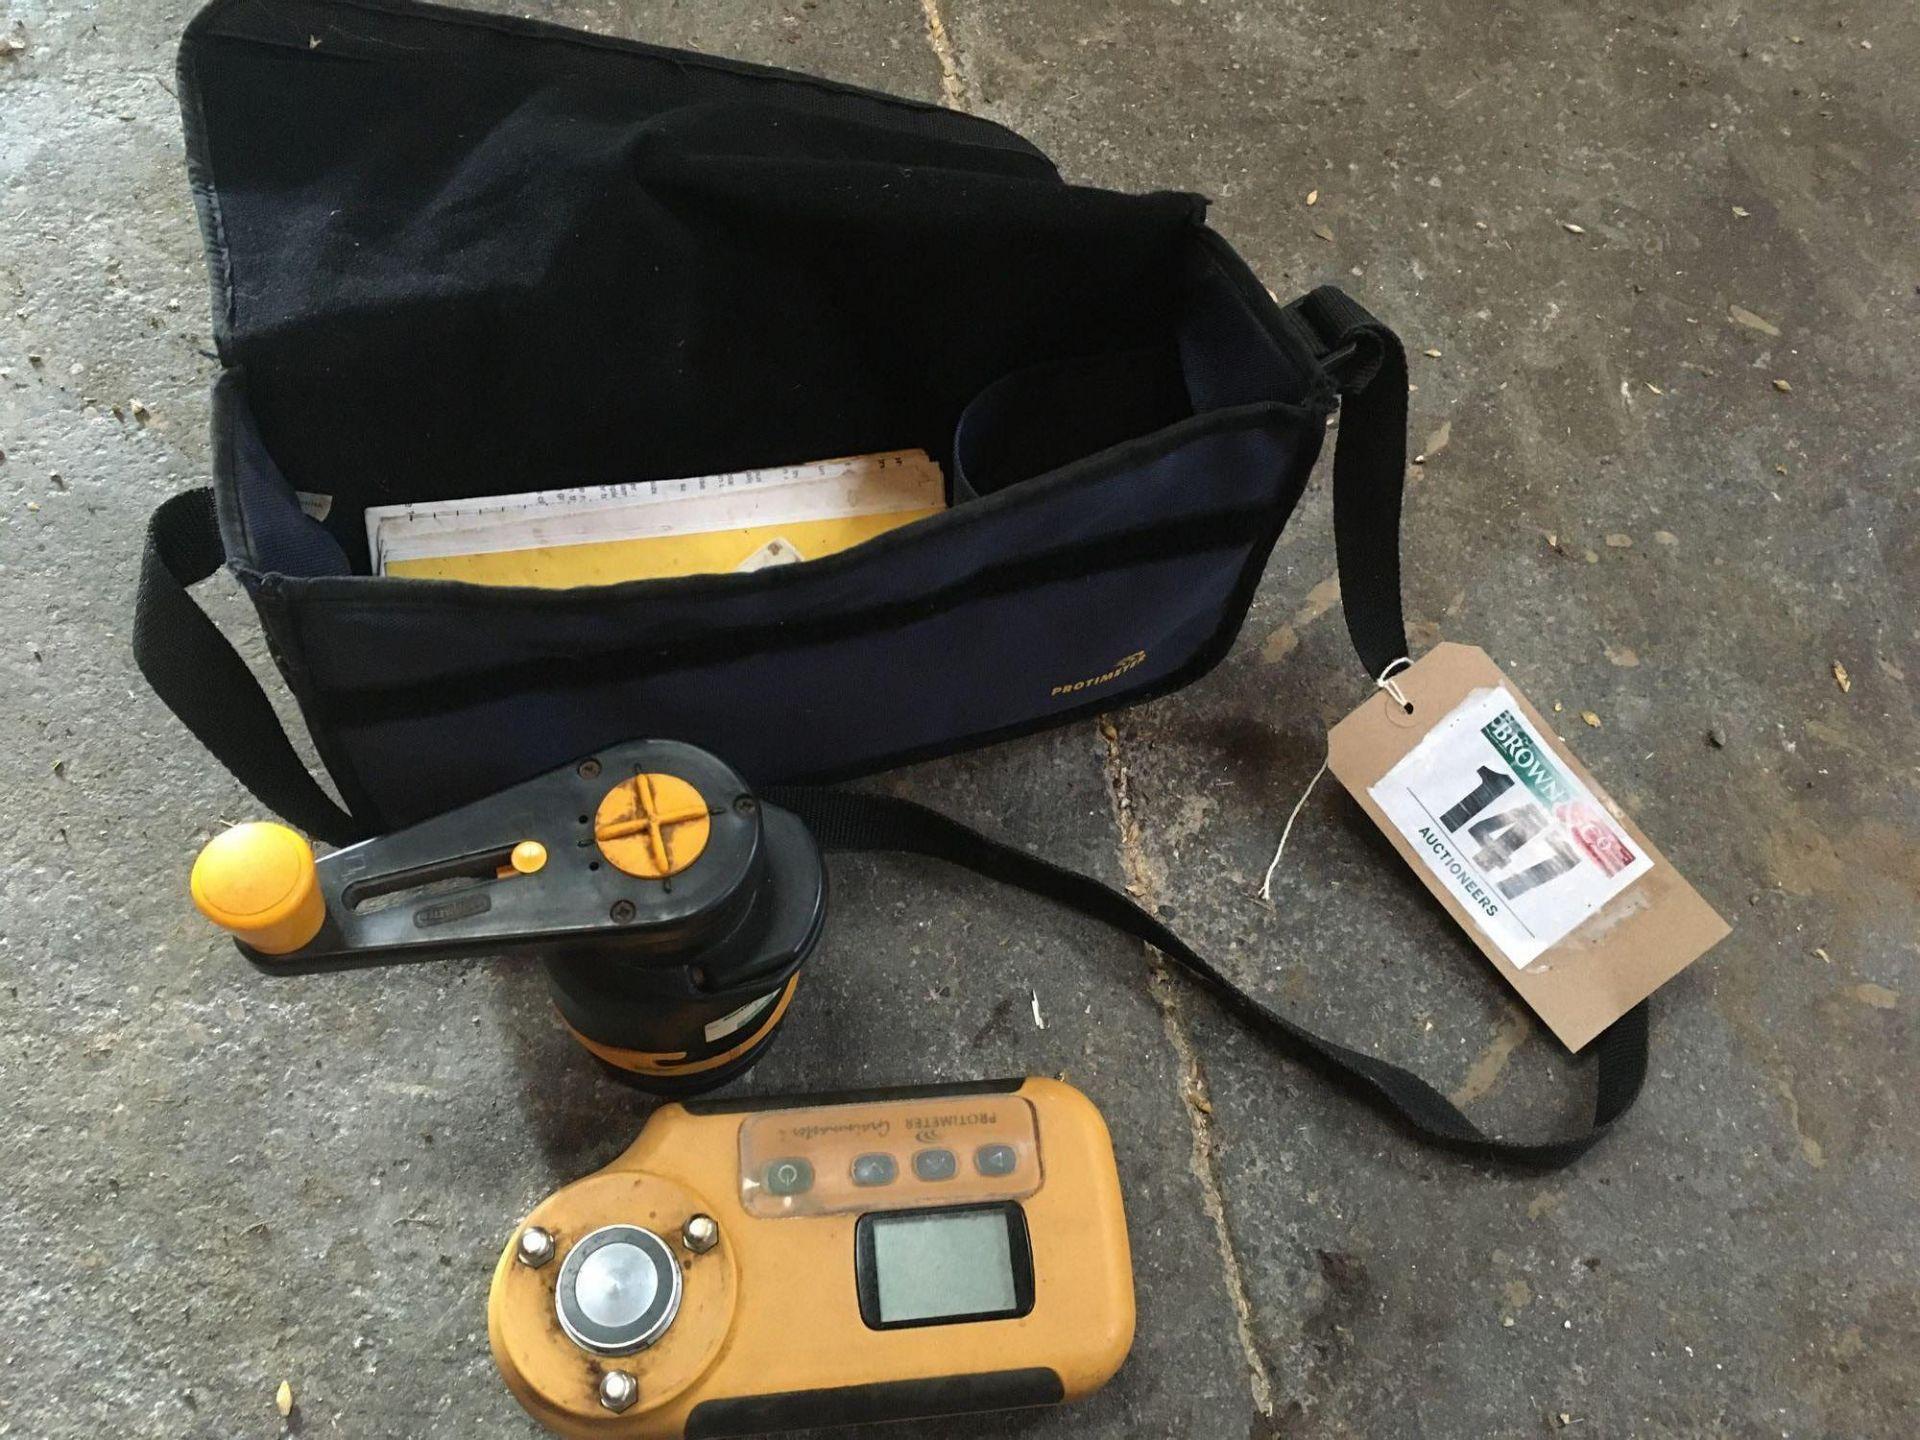 Protimeter moisture meter